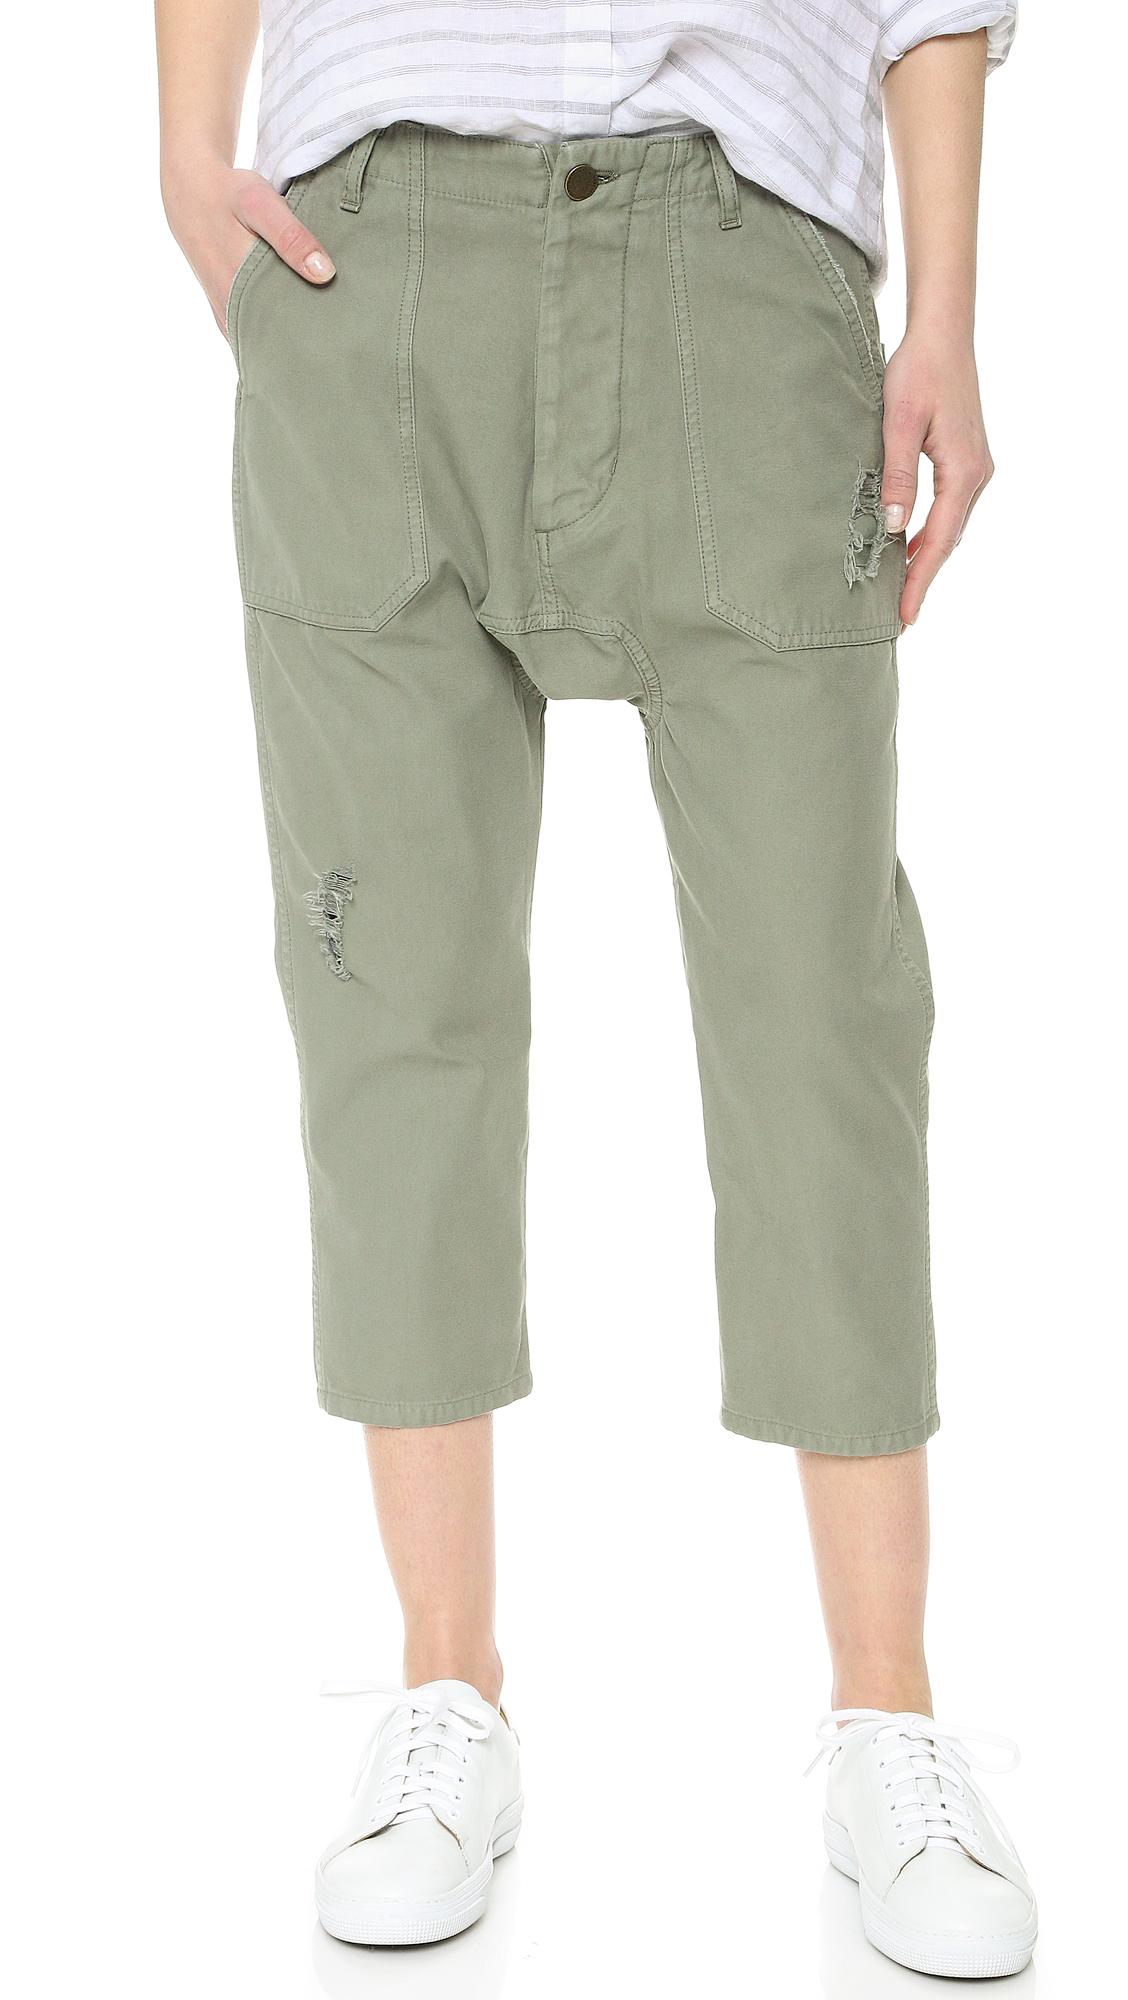 Etienne Marcel Slouchy Military Pants